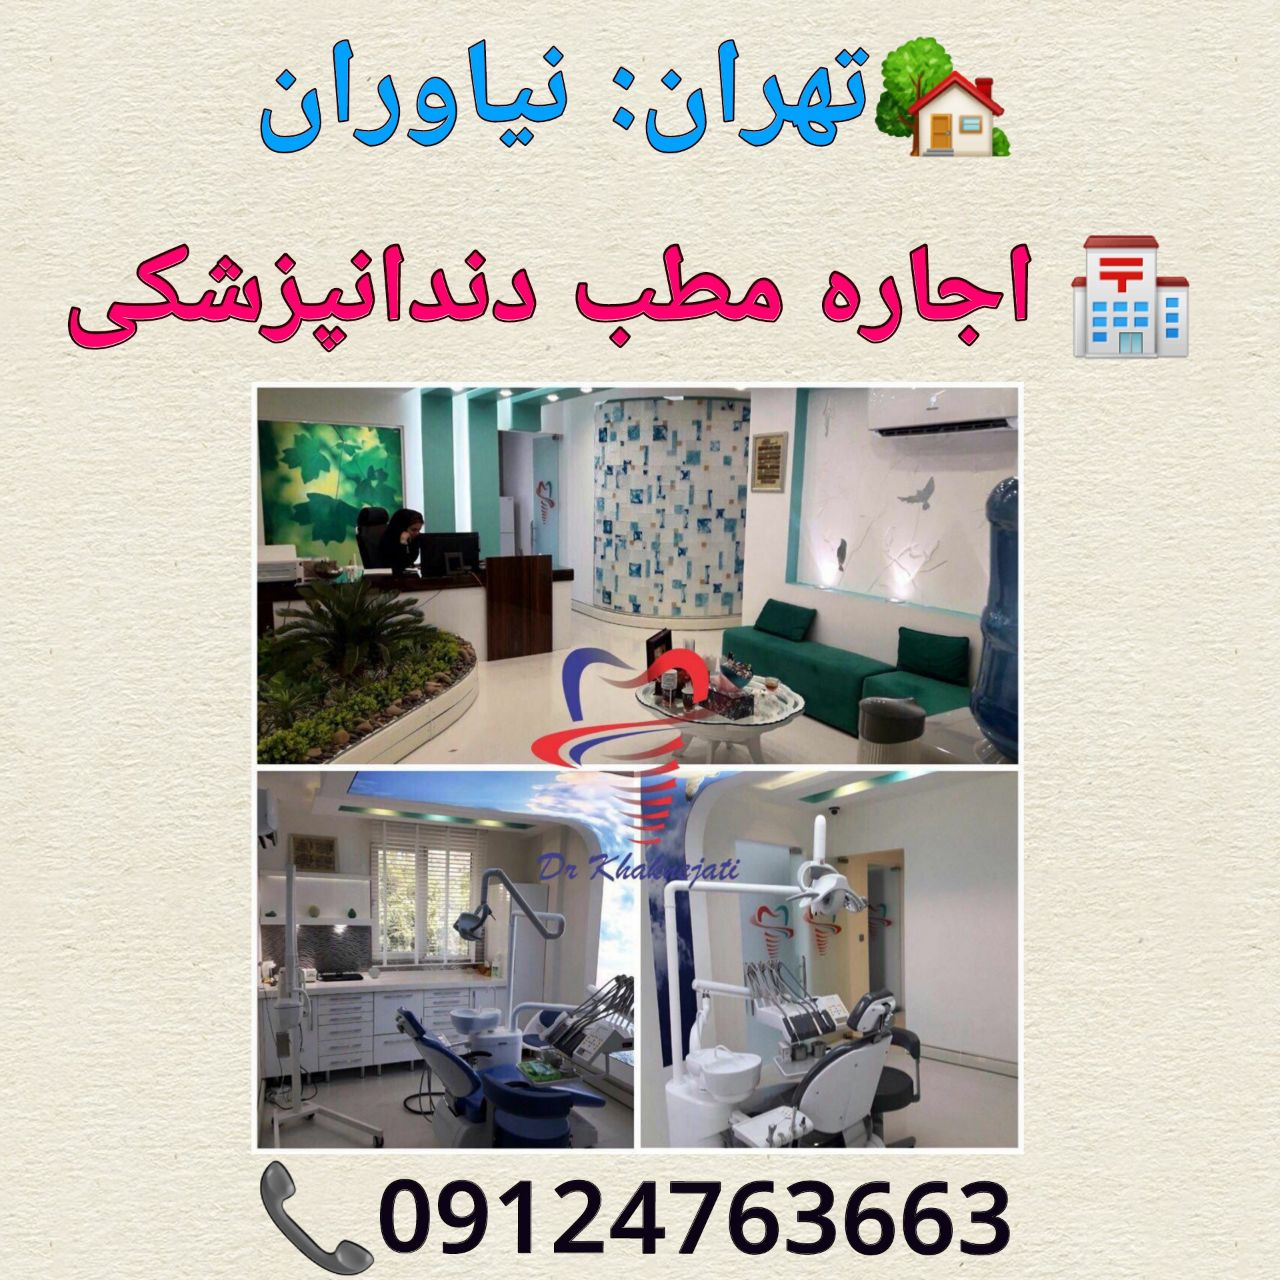 تهران: نیاوران، اجاره مطب دندانپزشکی